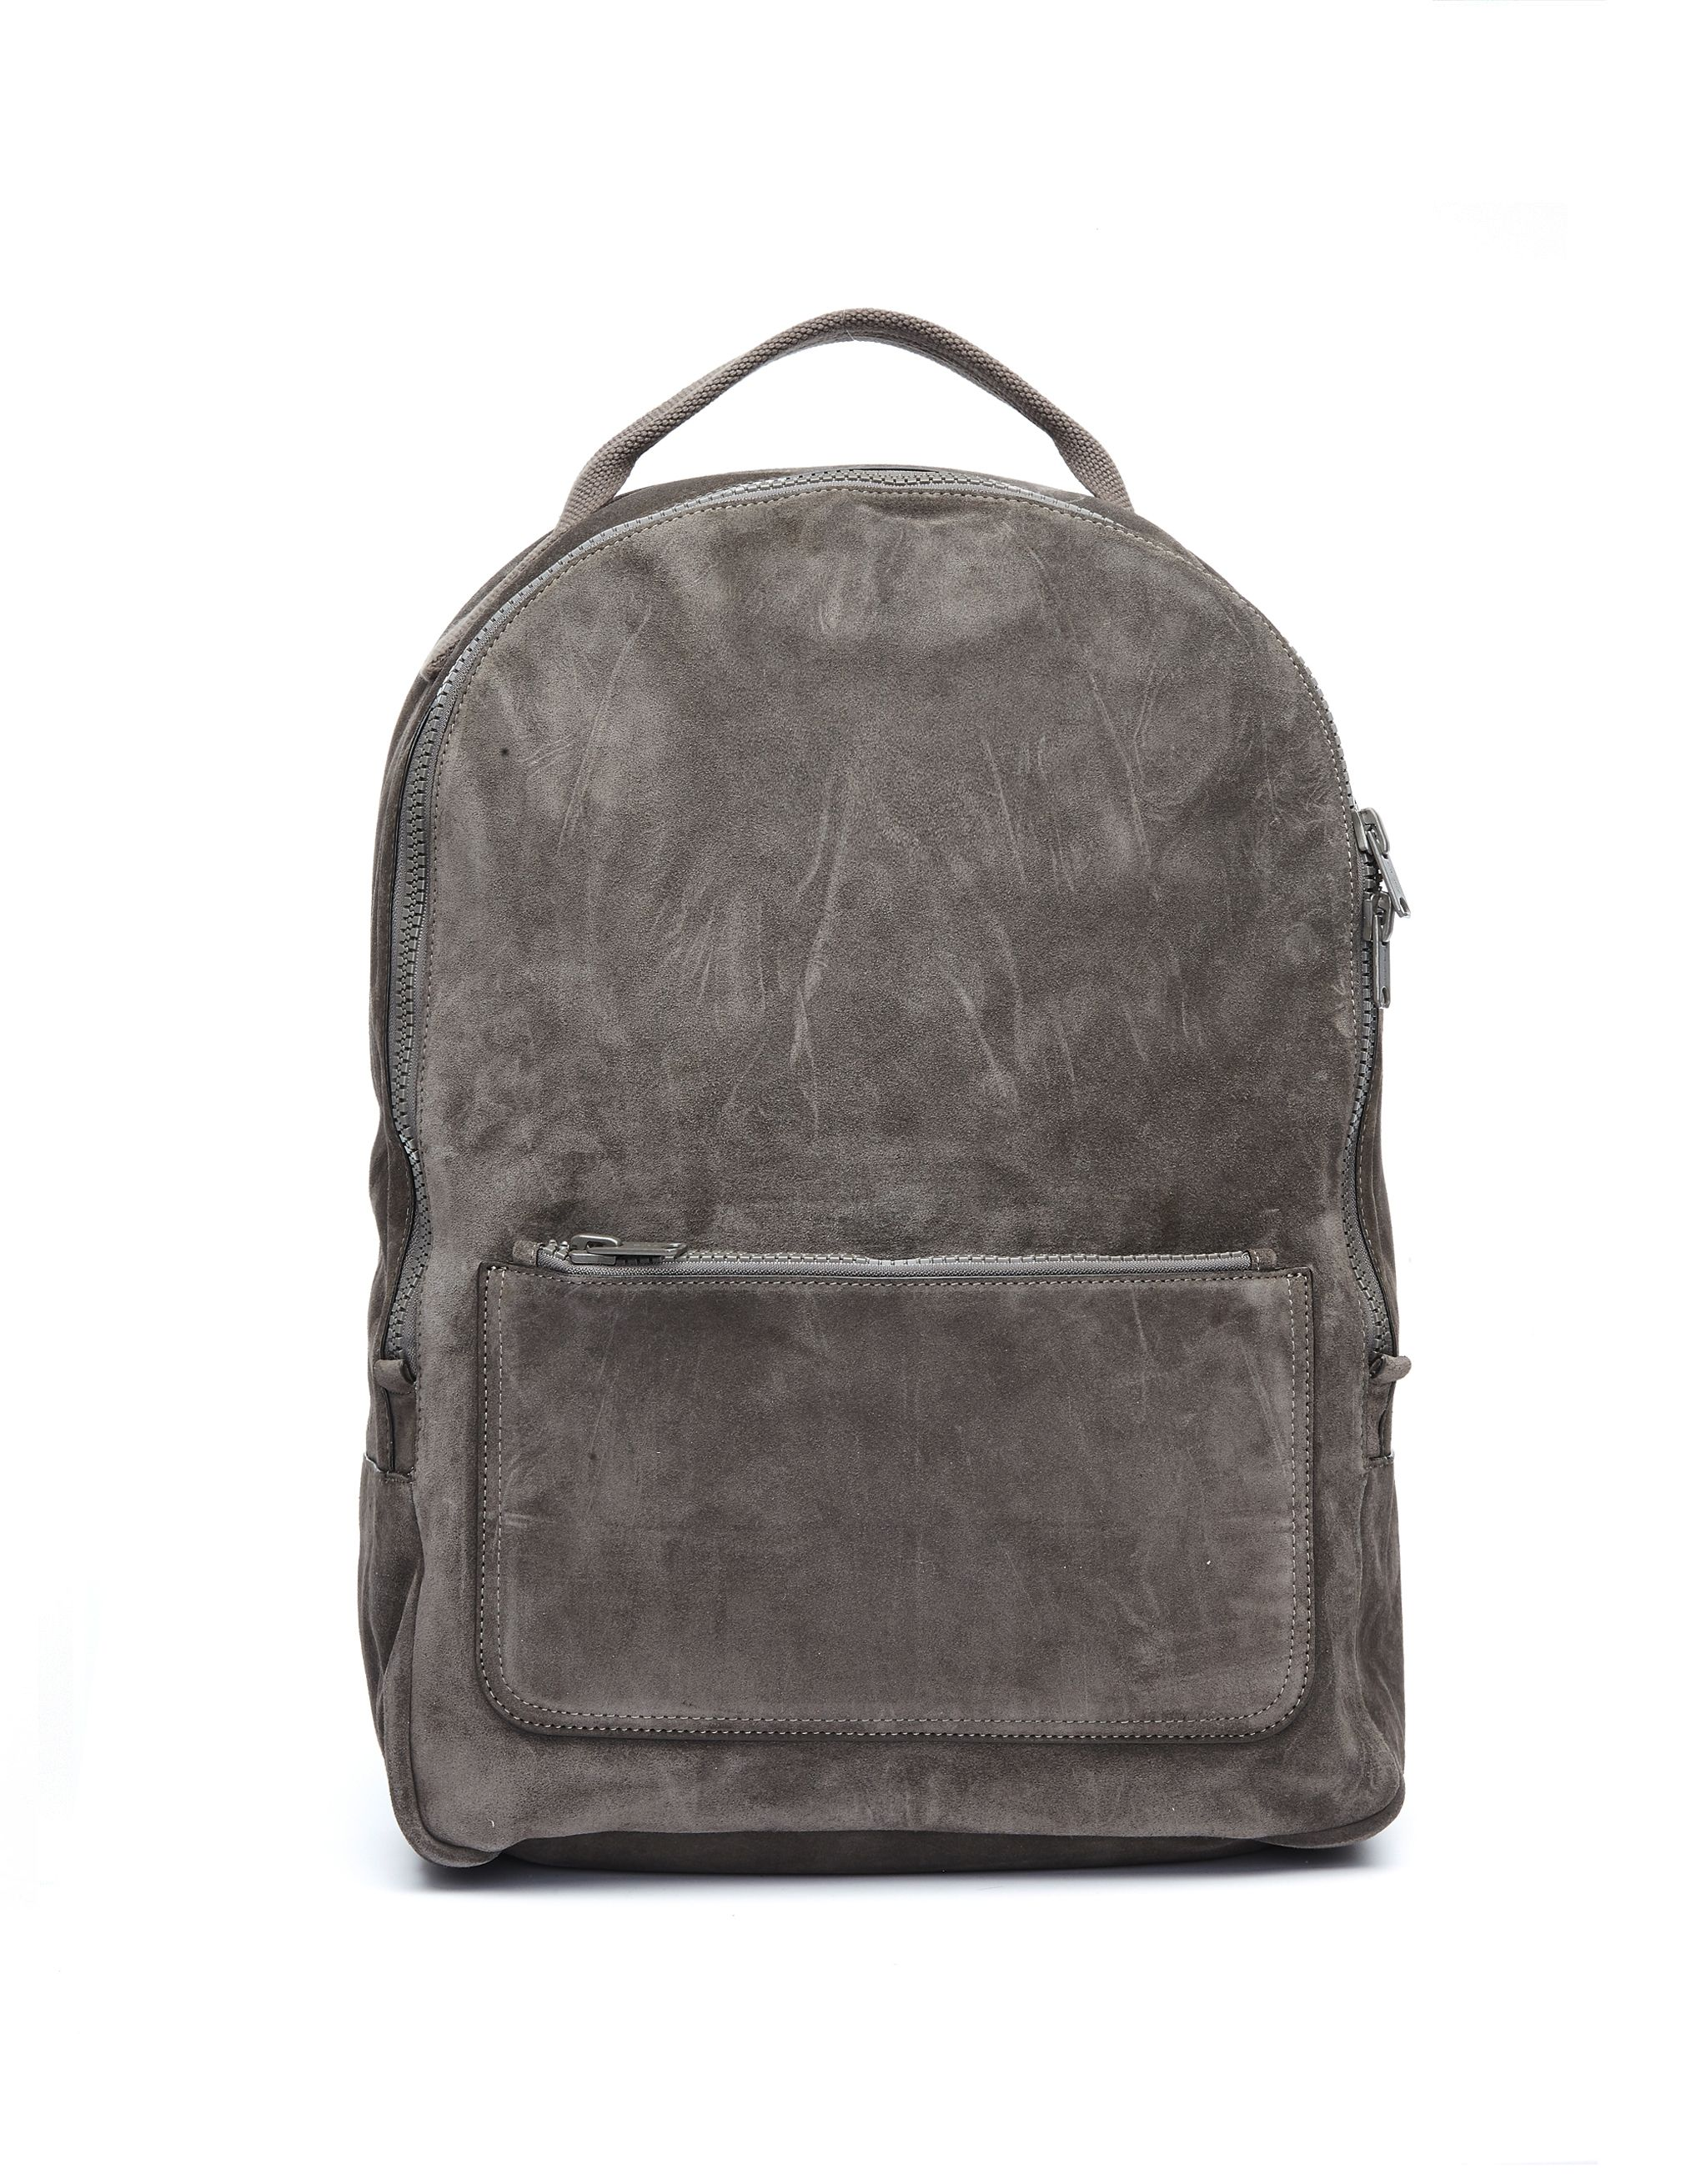 YEEZY BASIC GREY SUEDE BACKPACK.  yeezy  bags  backpacks  suede ... e2025e1960b1e